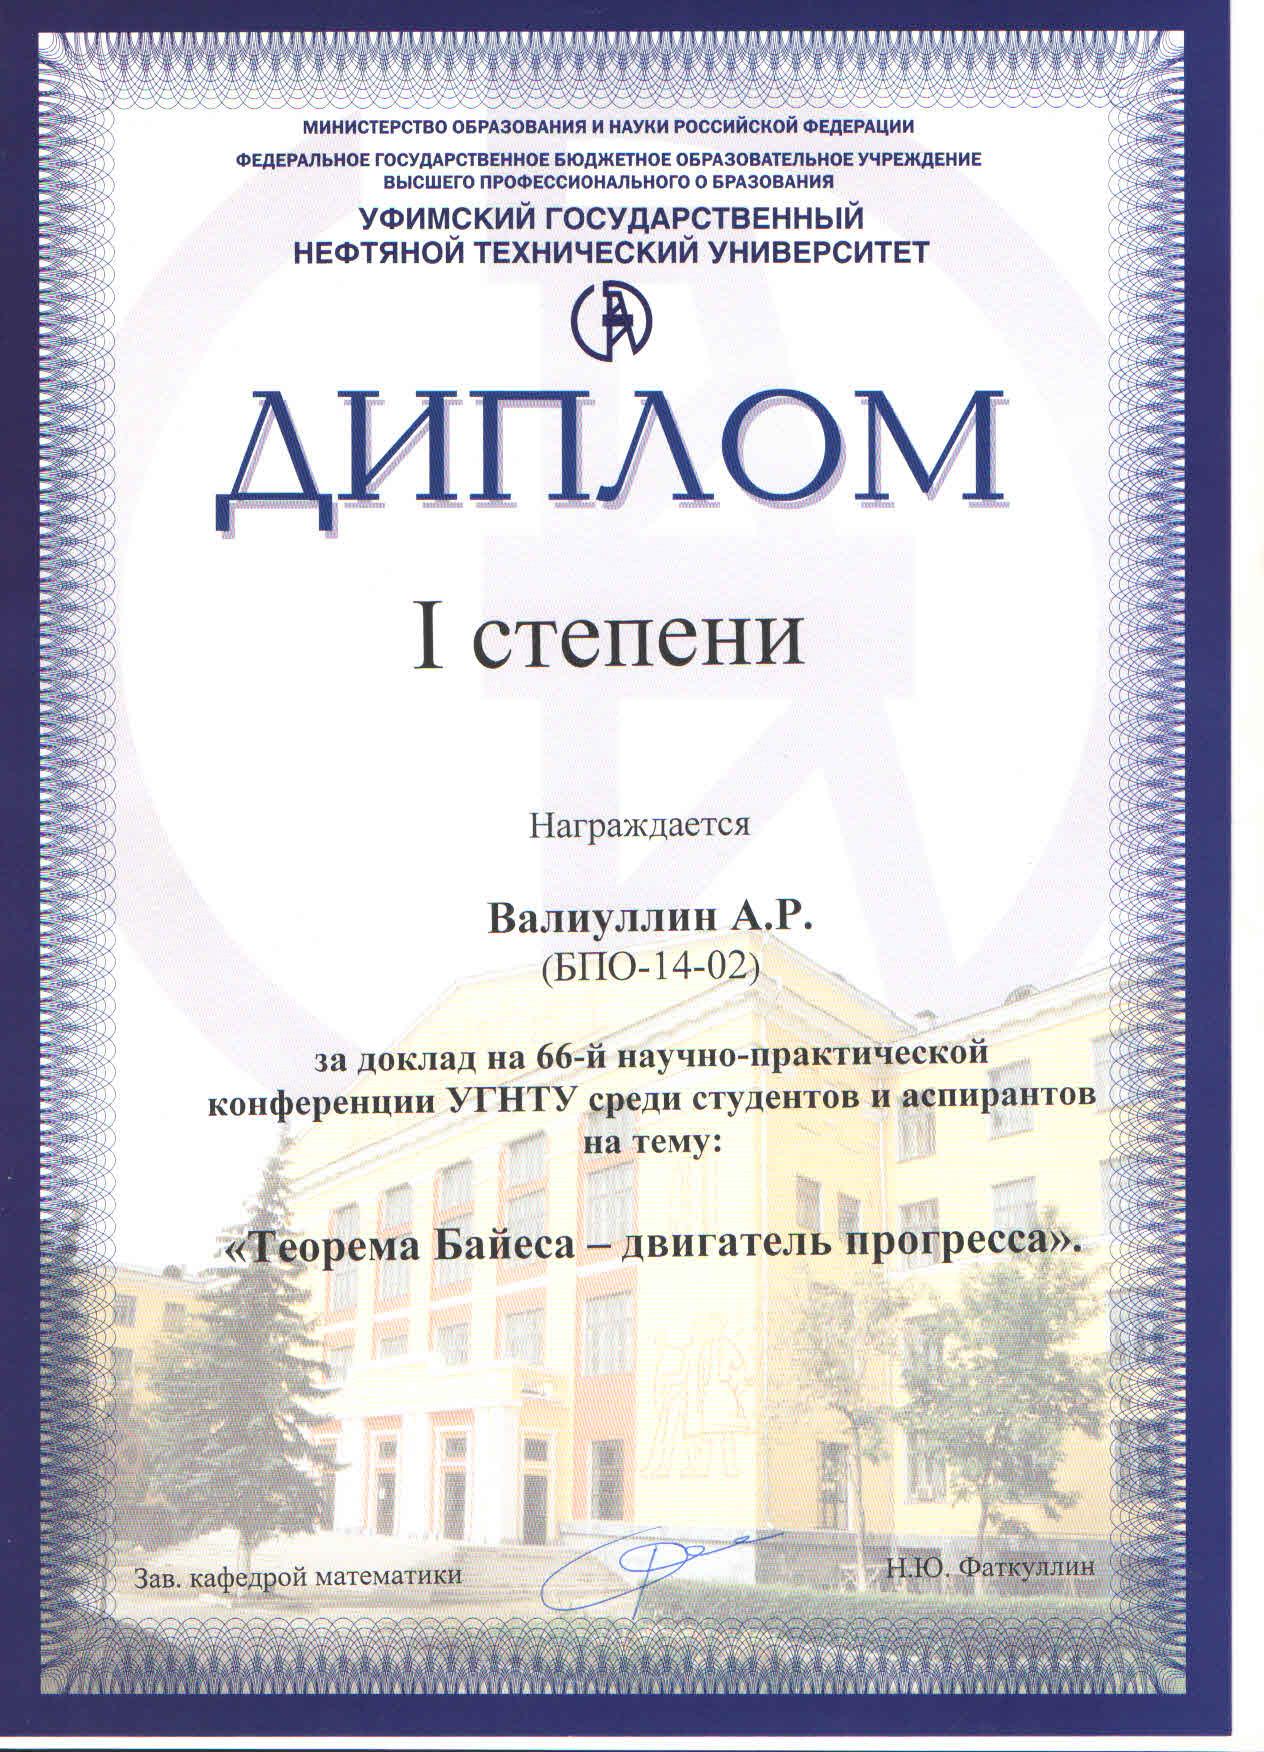 Валиуллин (БПО-14), #кафедравтик, #ВТИК, #ФАПП, #УГНТУ, #USPTU